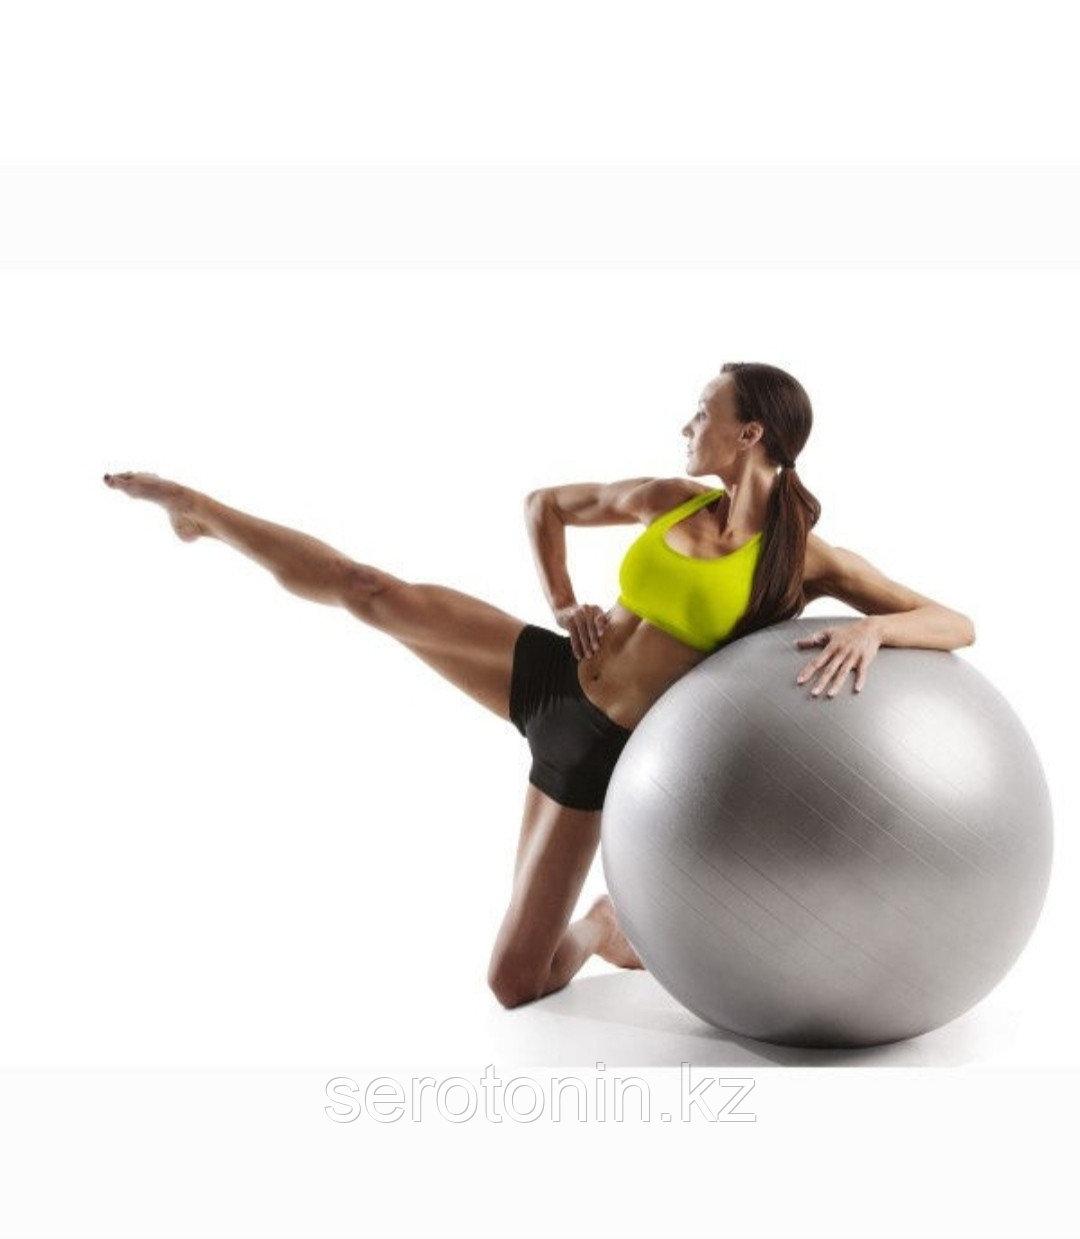 Мяч гимнастический (Фитбол) 100 см - фото 4